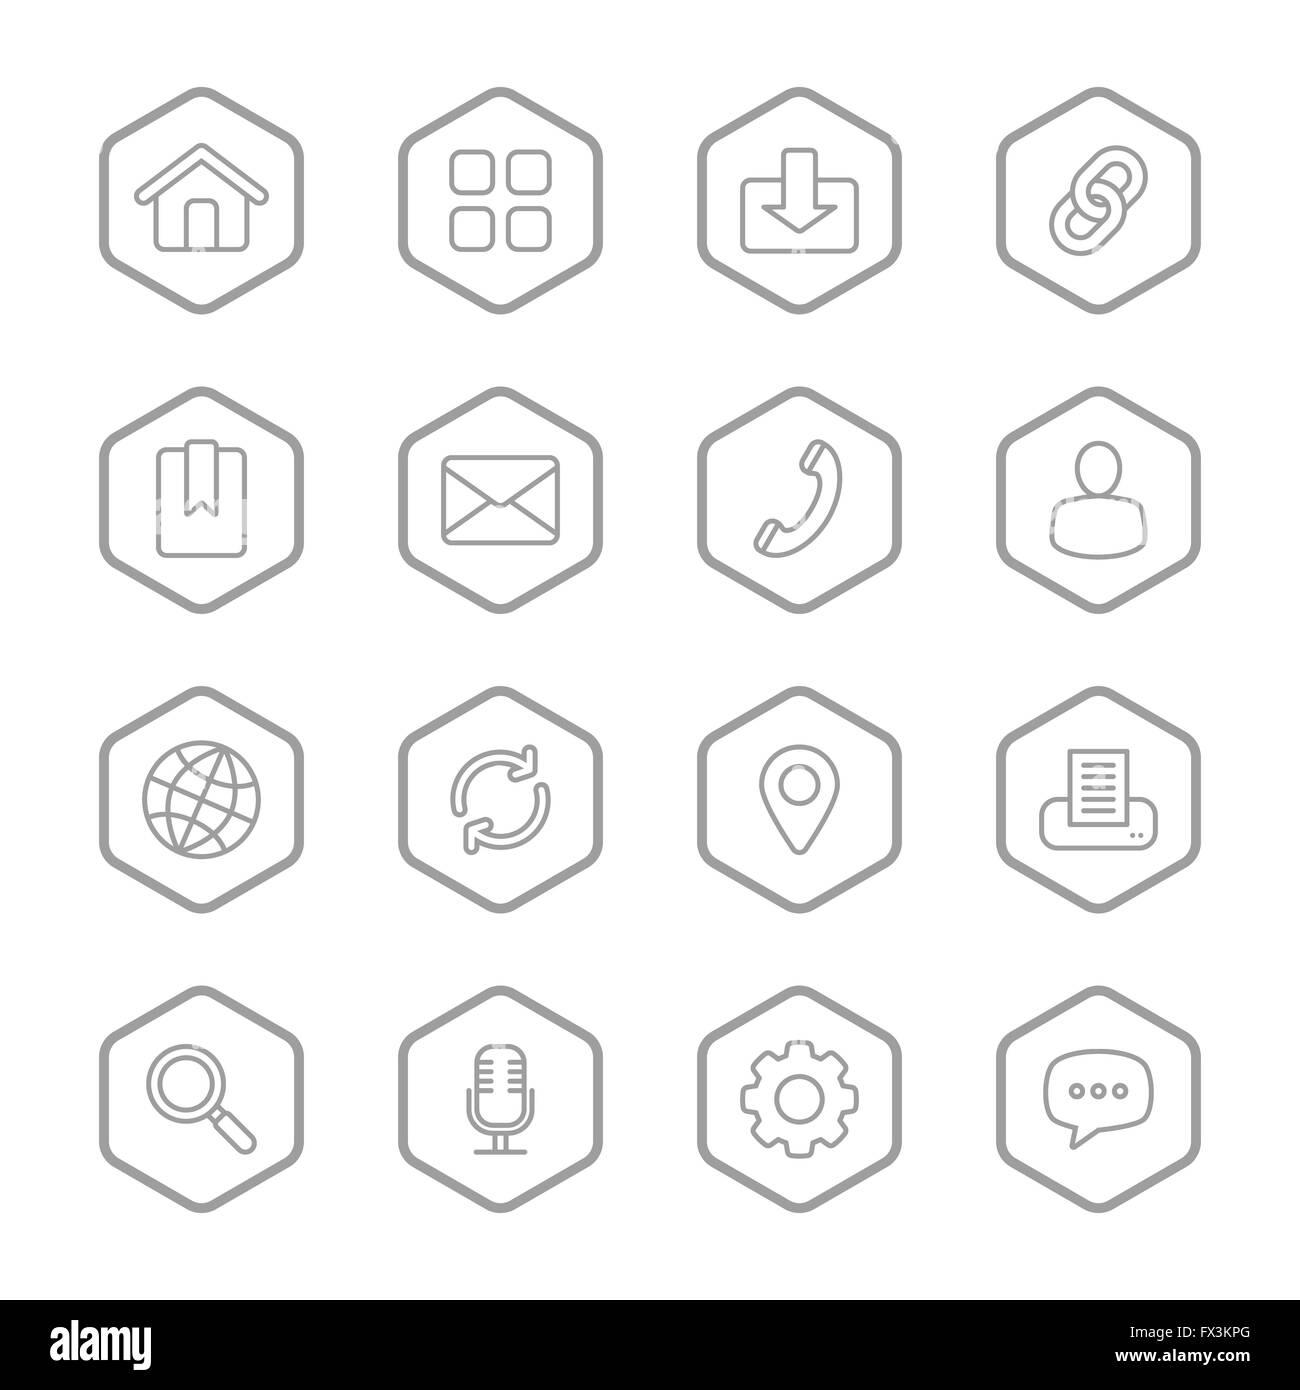 JPEG] gray line web icon set with hexagon frame for web, UI Stock ...